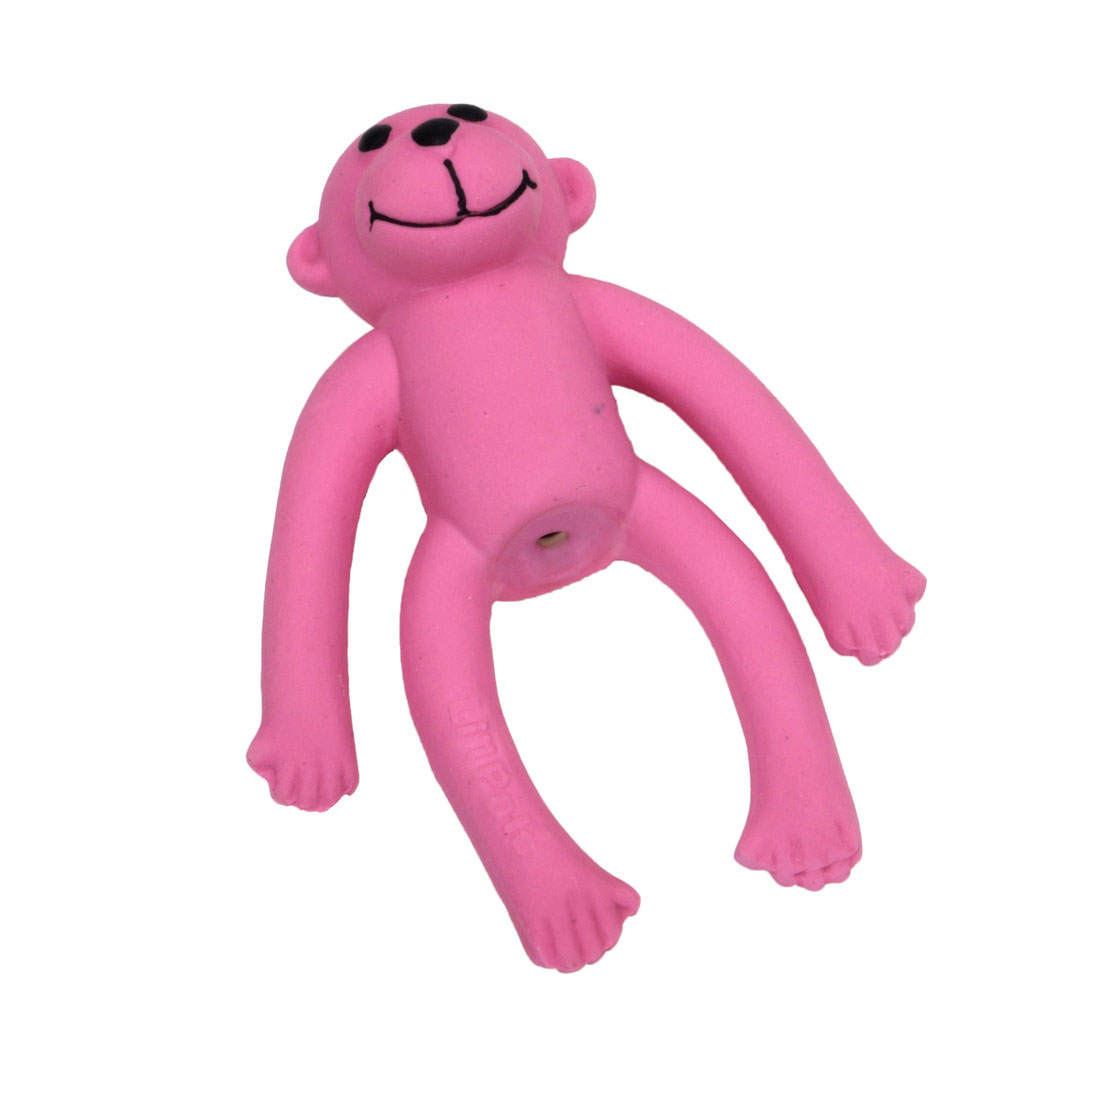 Li'l Pals Latex Monkey Dog Toy, Pink, 4-in